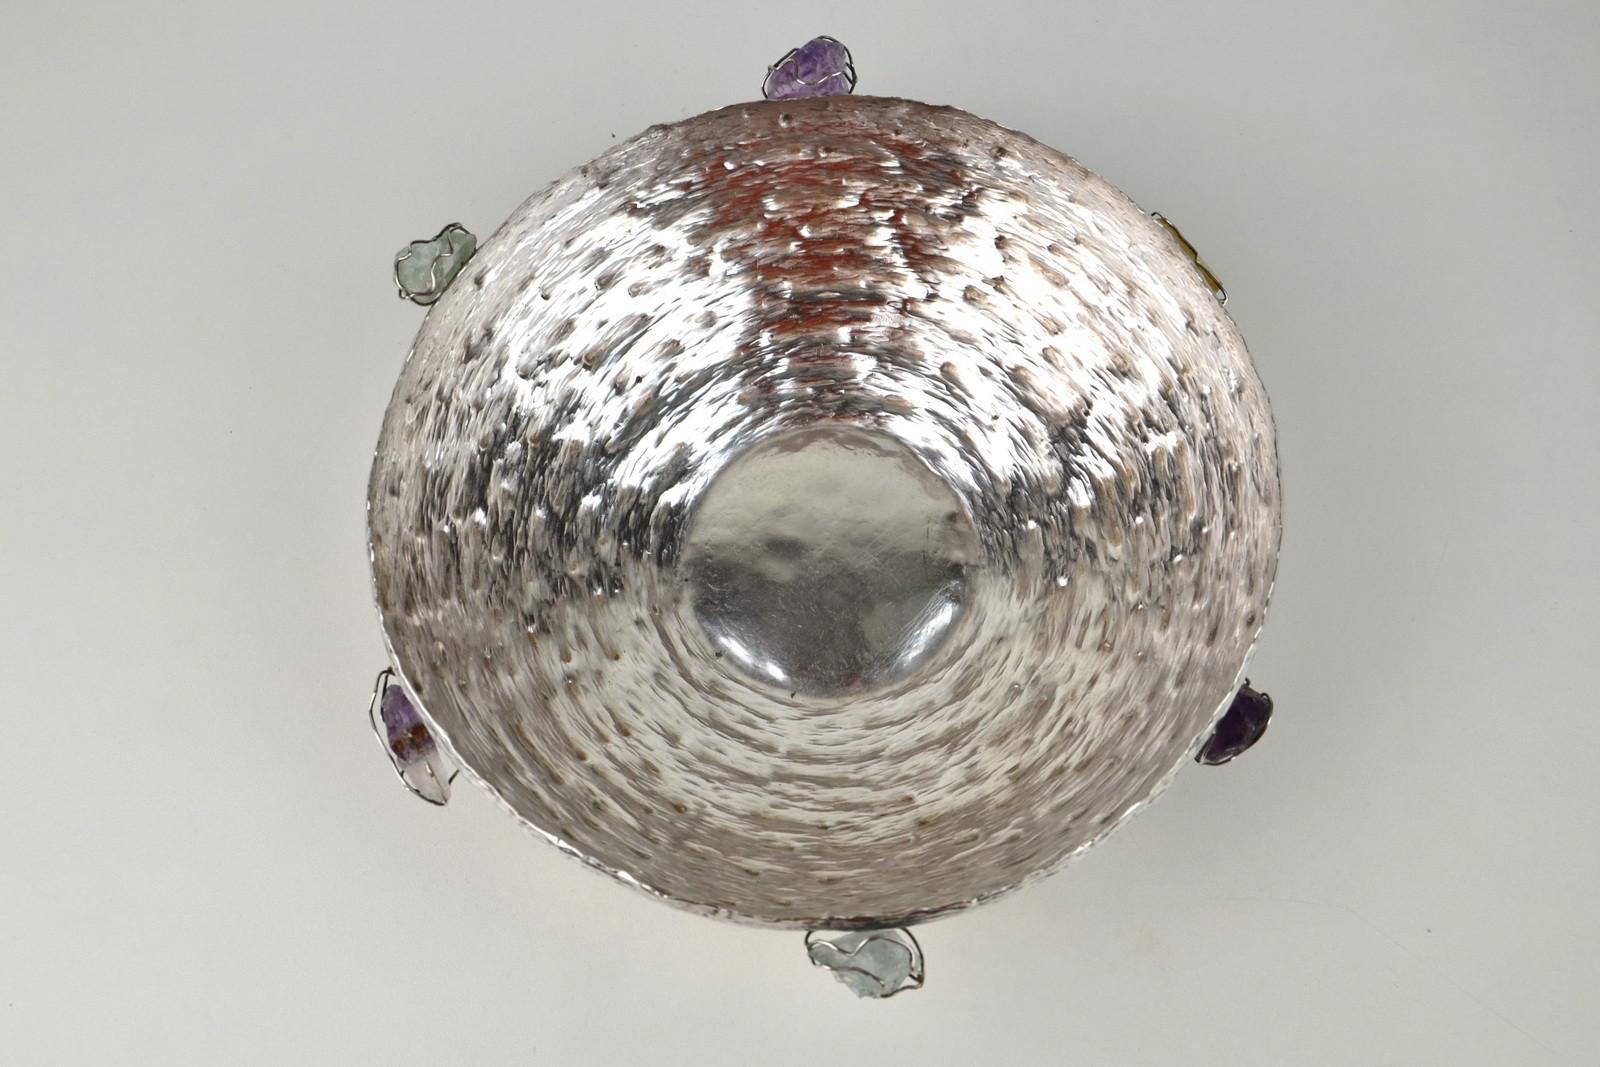 centrotavola-argento-galvan-70-con-pietre-5,2031.jpg?WebbinsCacheCounter=1